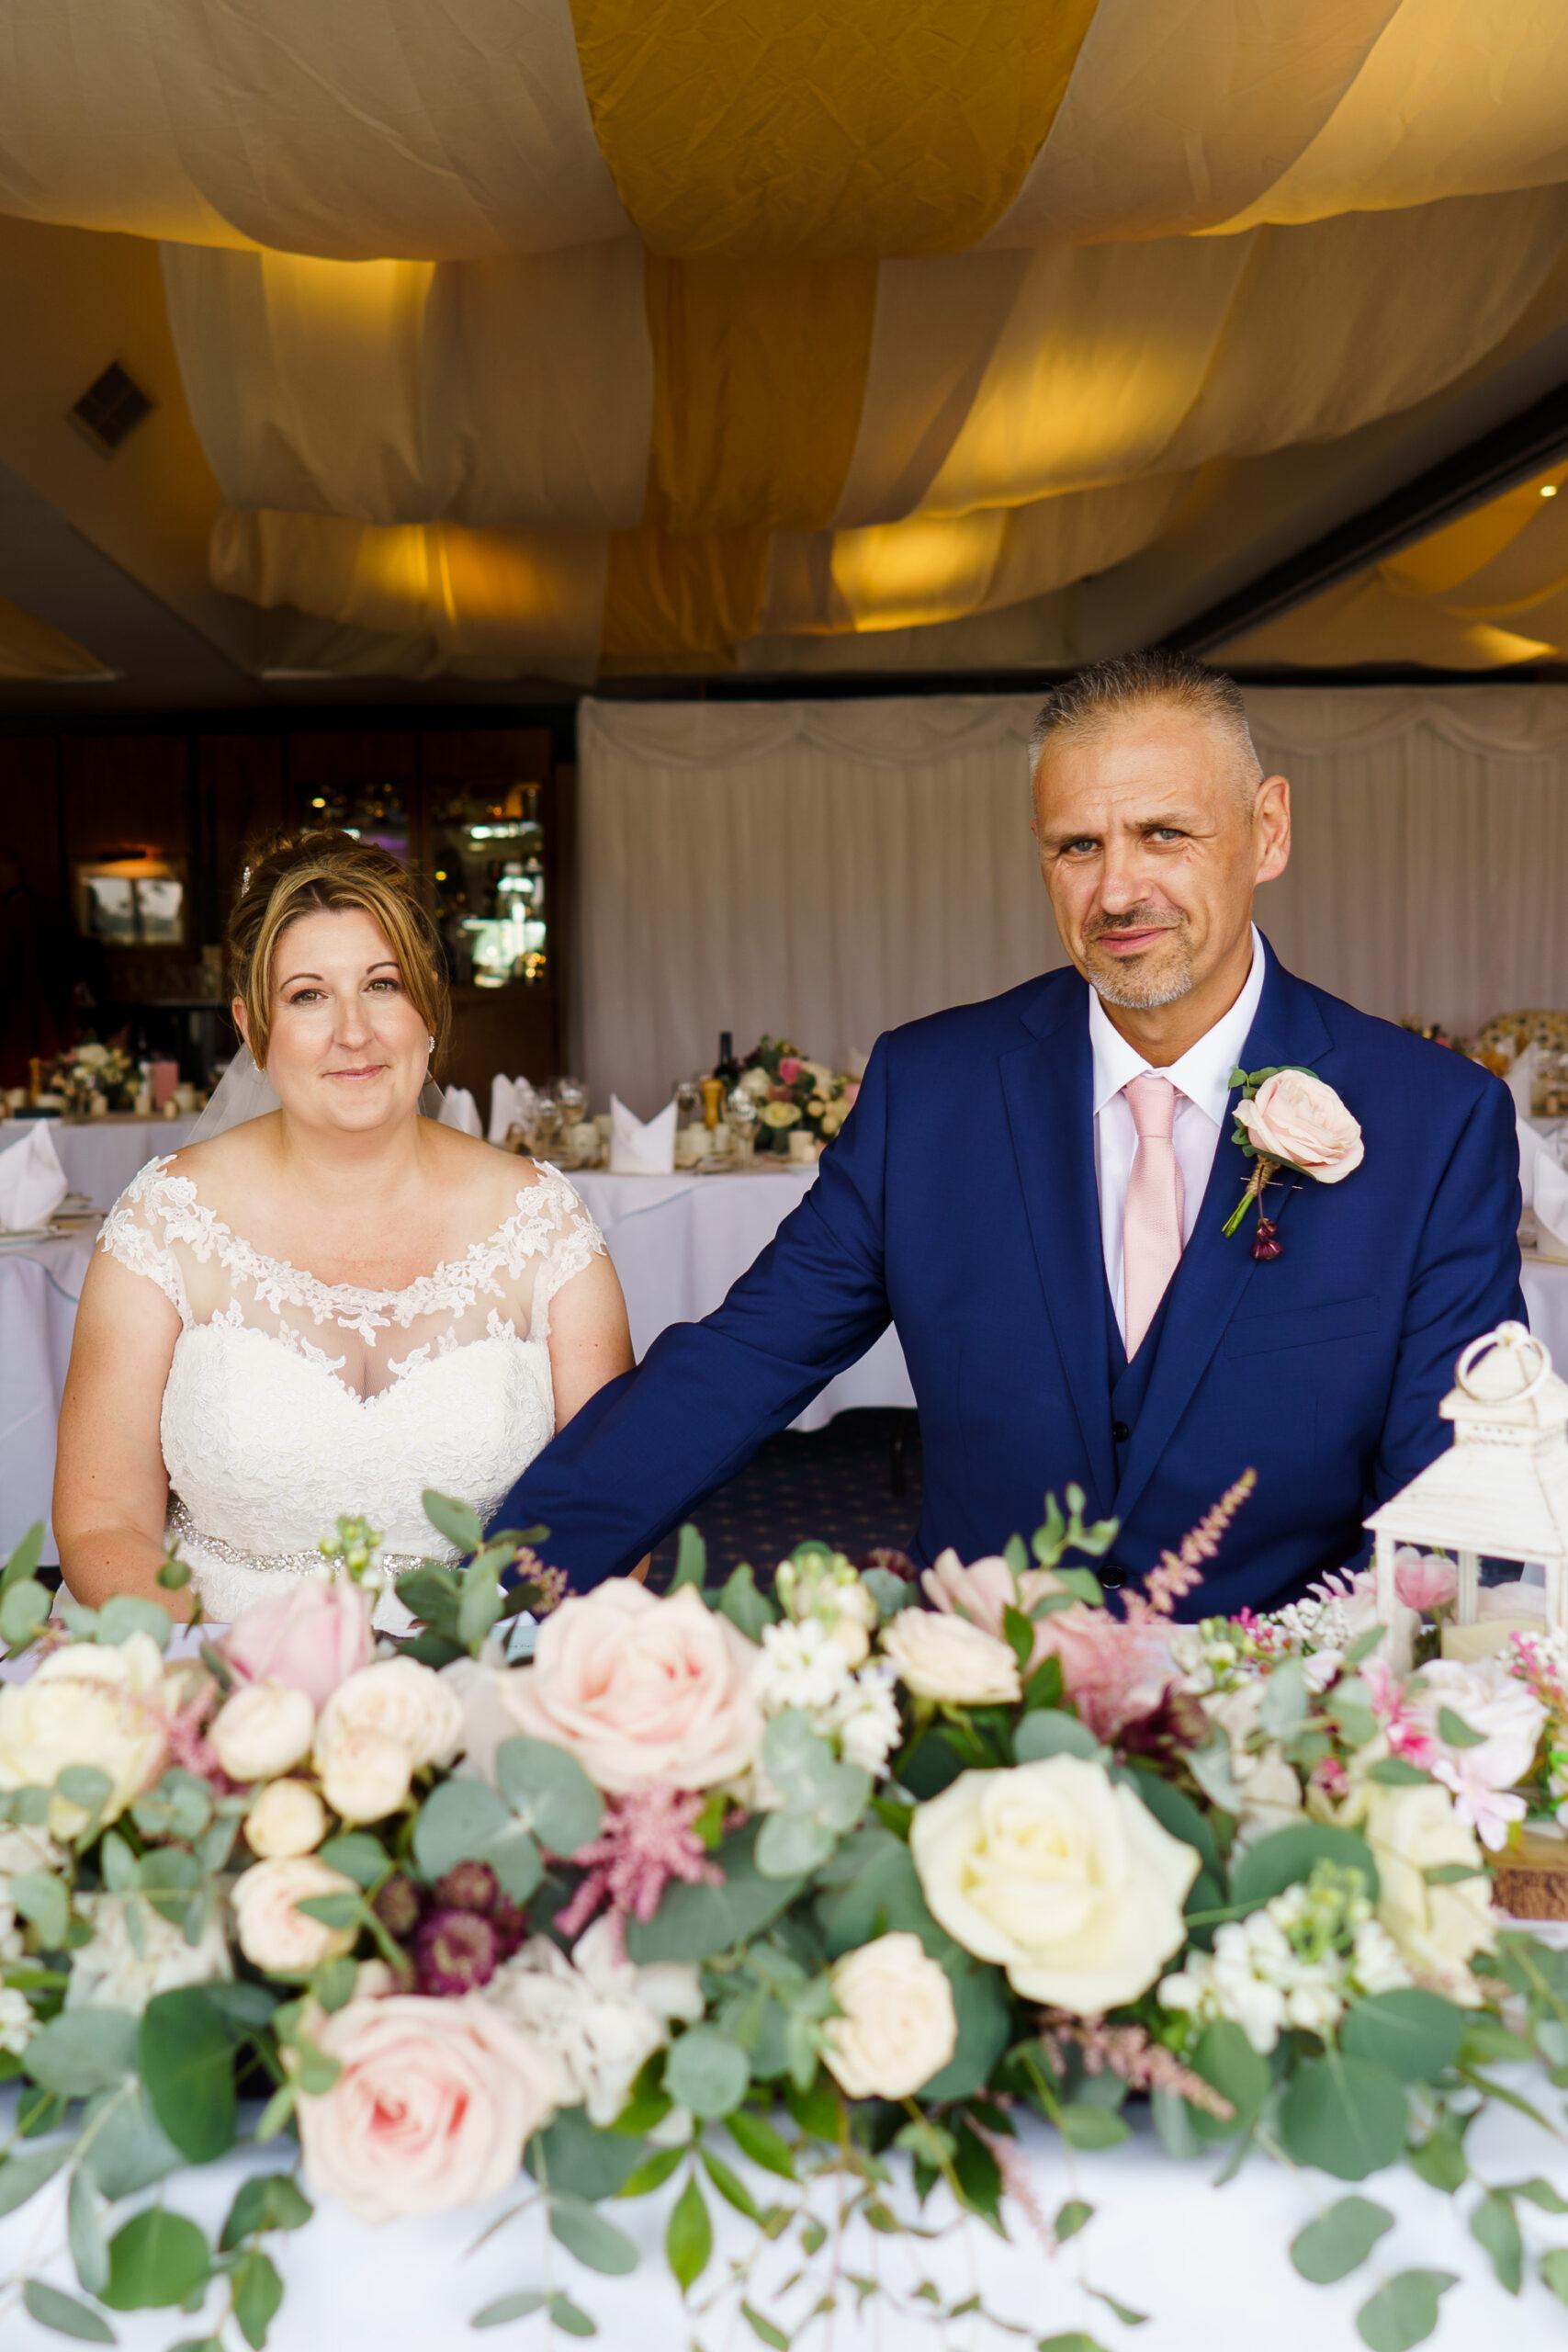 brdie and groom at royal southern yacht club